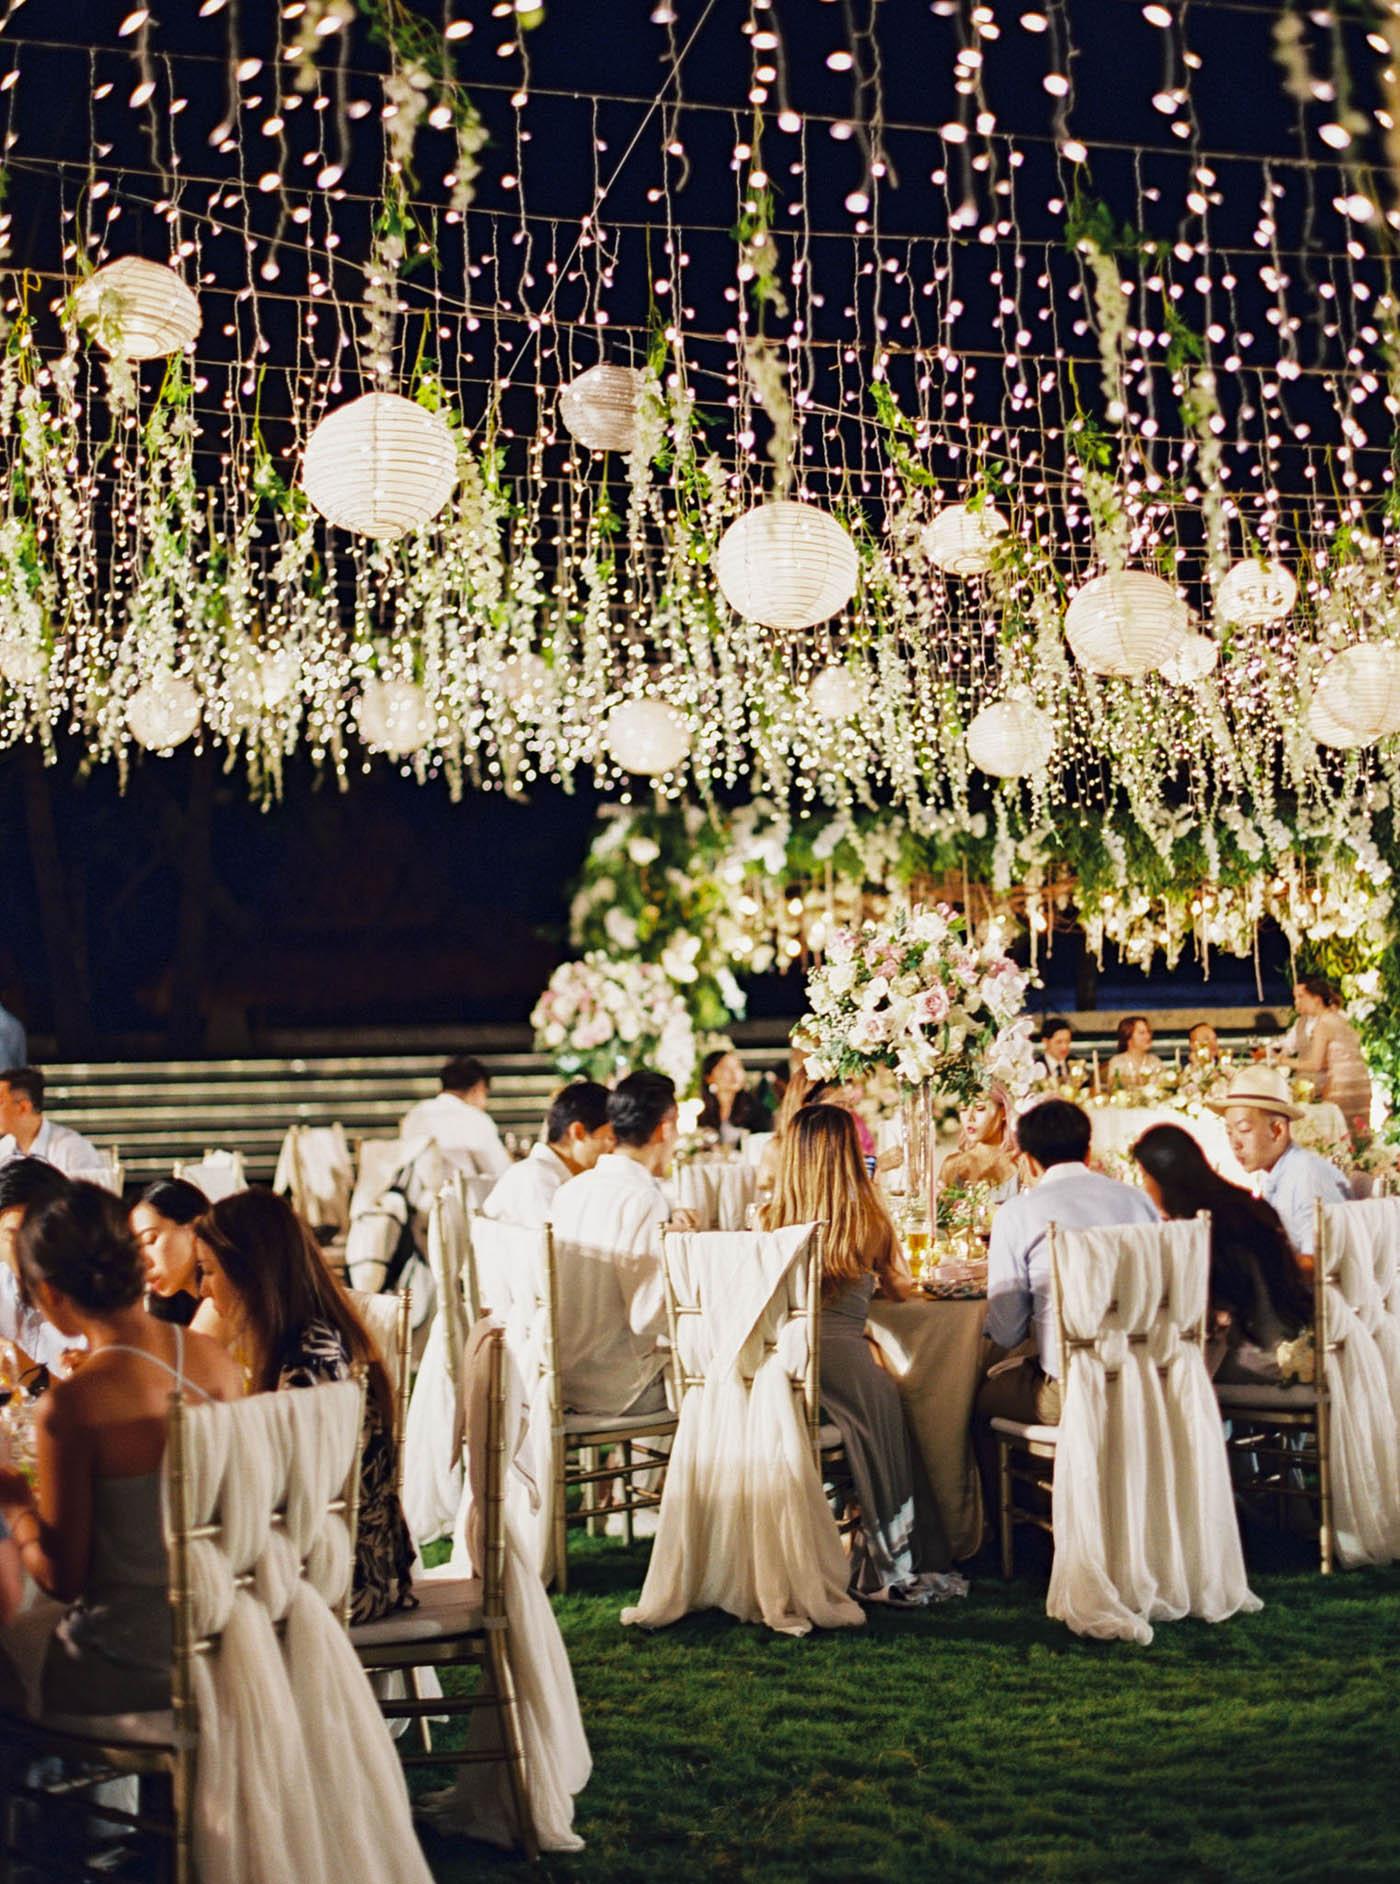 峇里島婚禮-STAGE-fine-art-film-wedding-海外